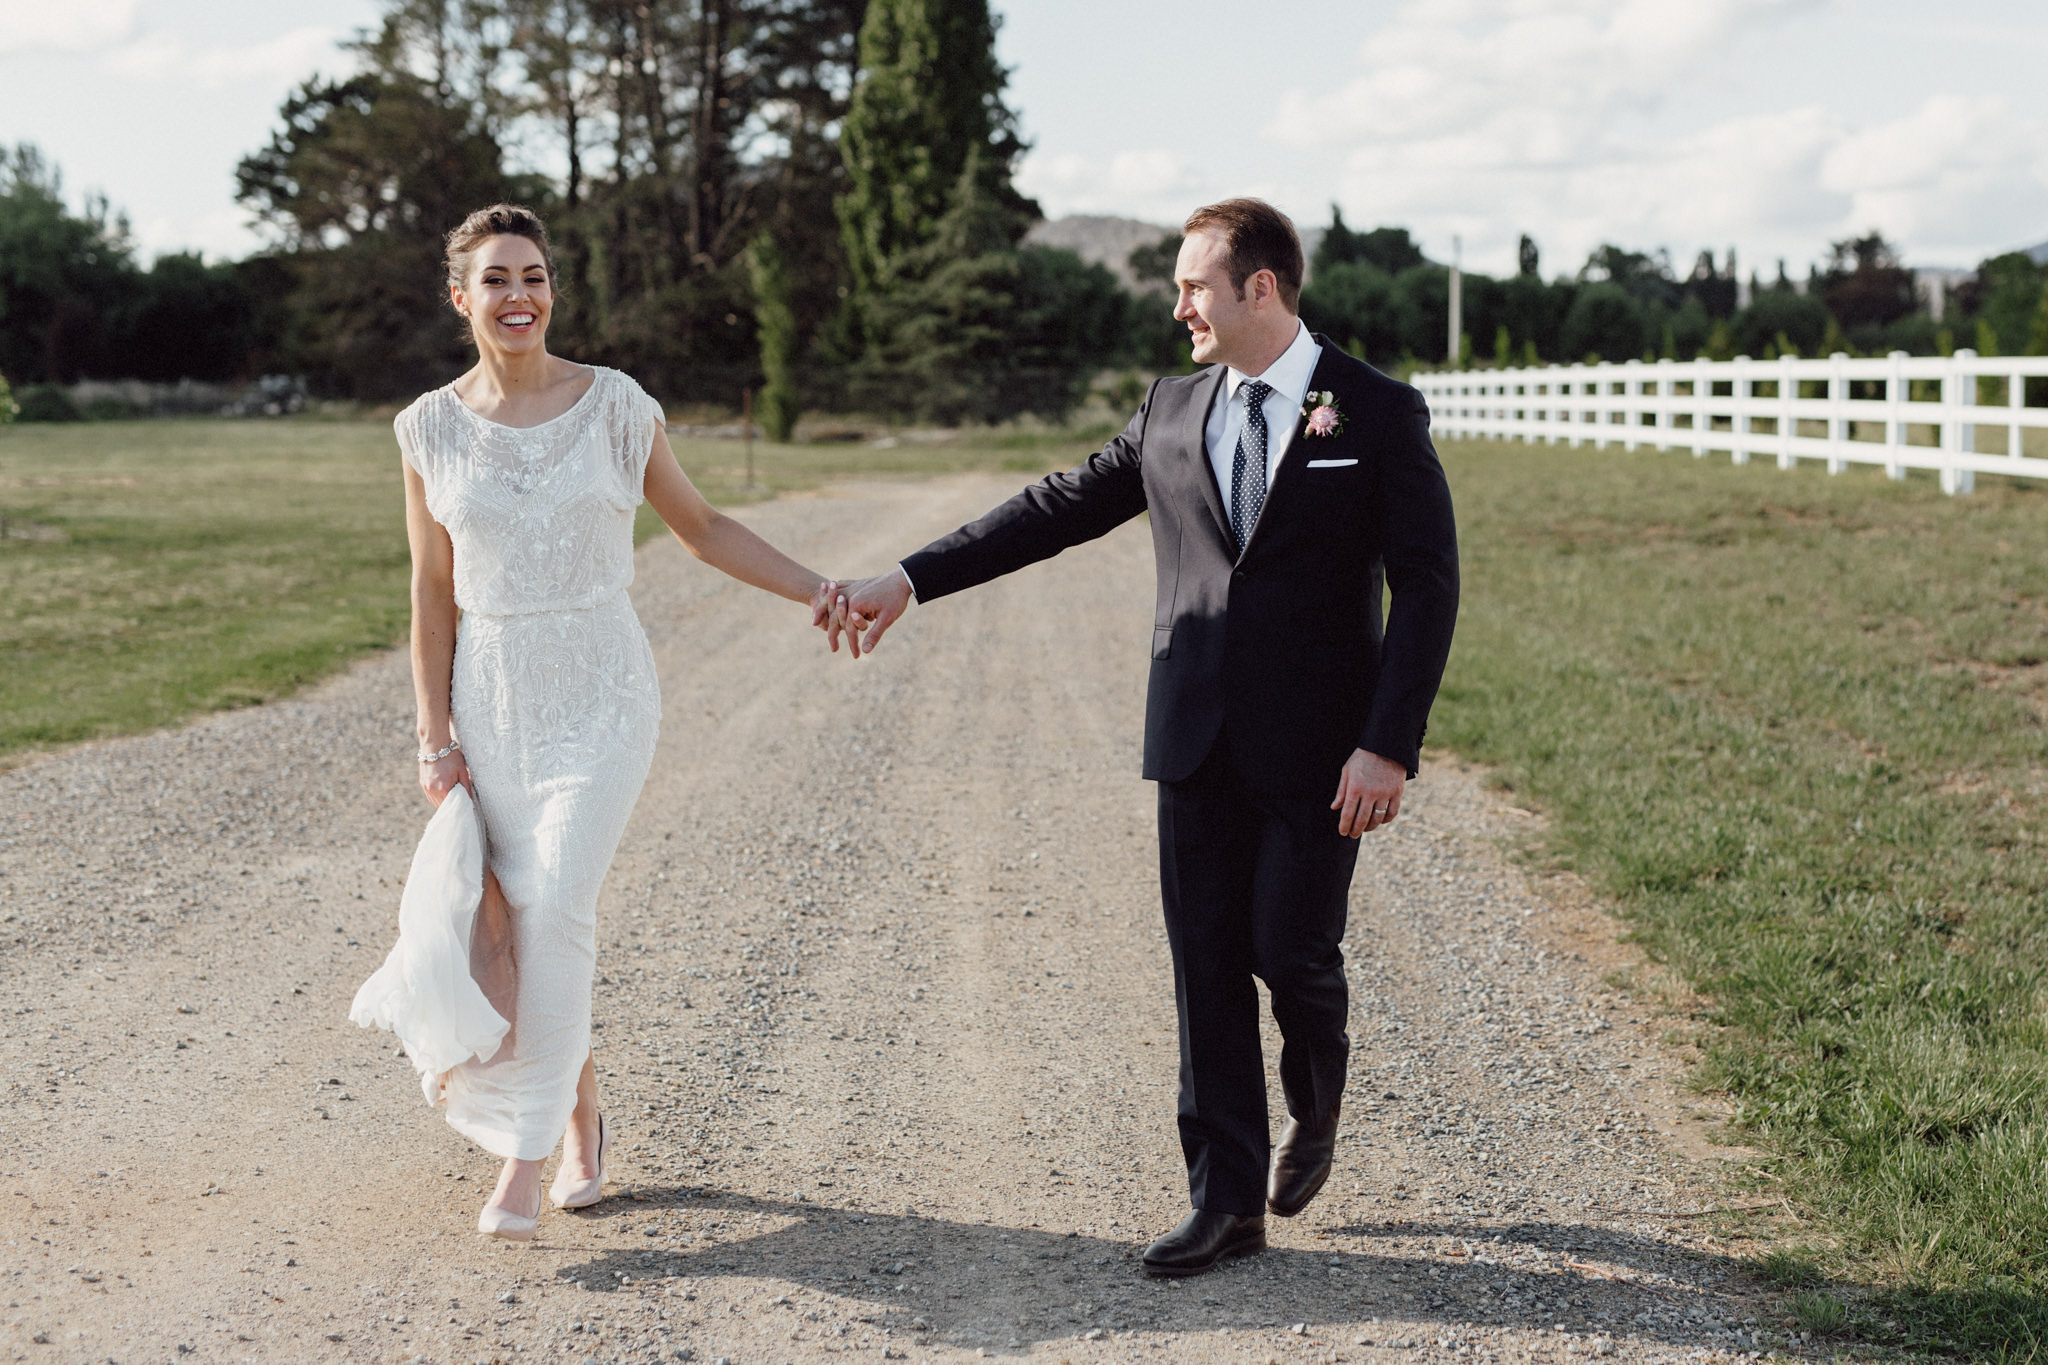 lightroom presets, wedding presets, portrait presets, adobe camera raw presets, photoshop wedding presets, moody, light airy, vsco inspired, mastin inspired, harsh light wedding presets